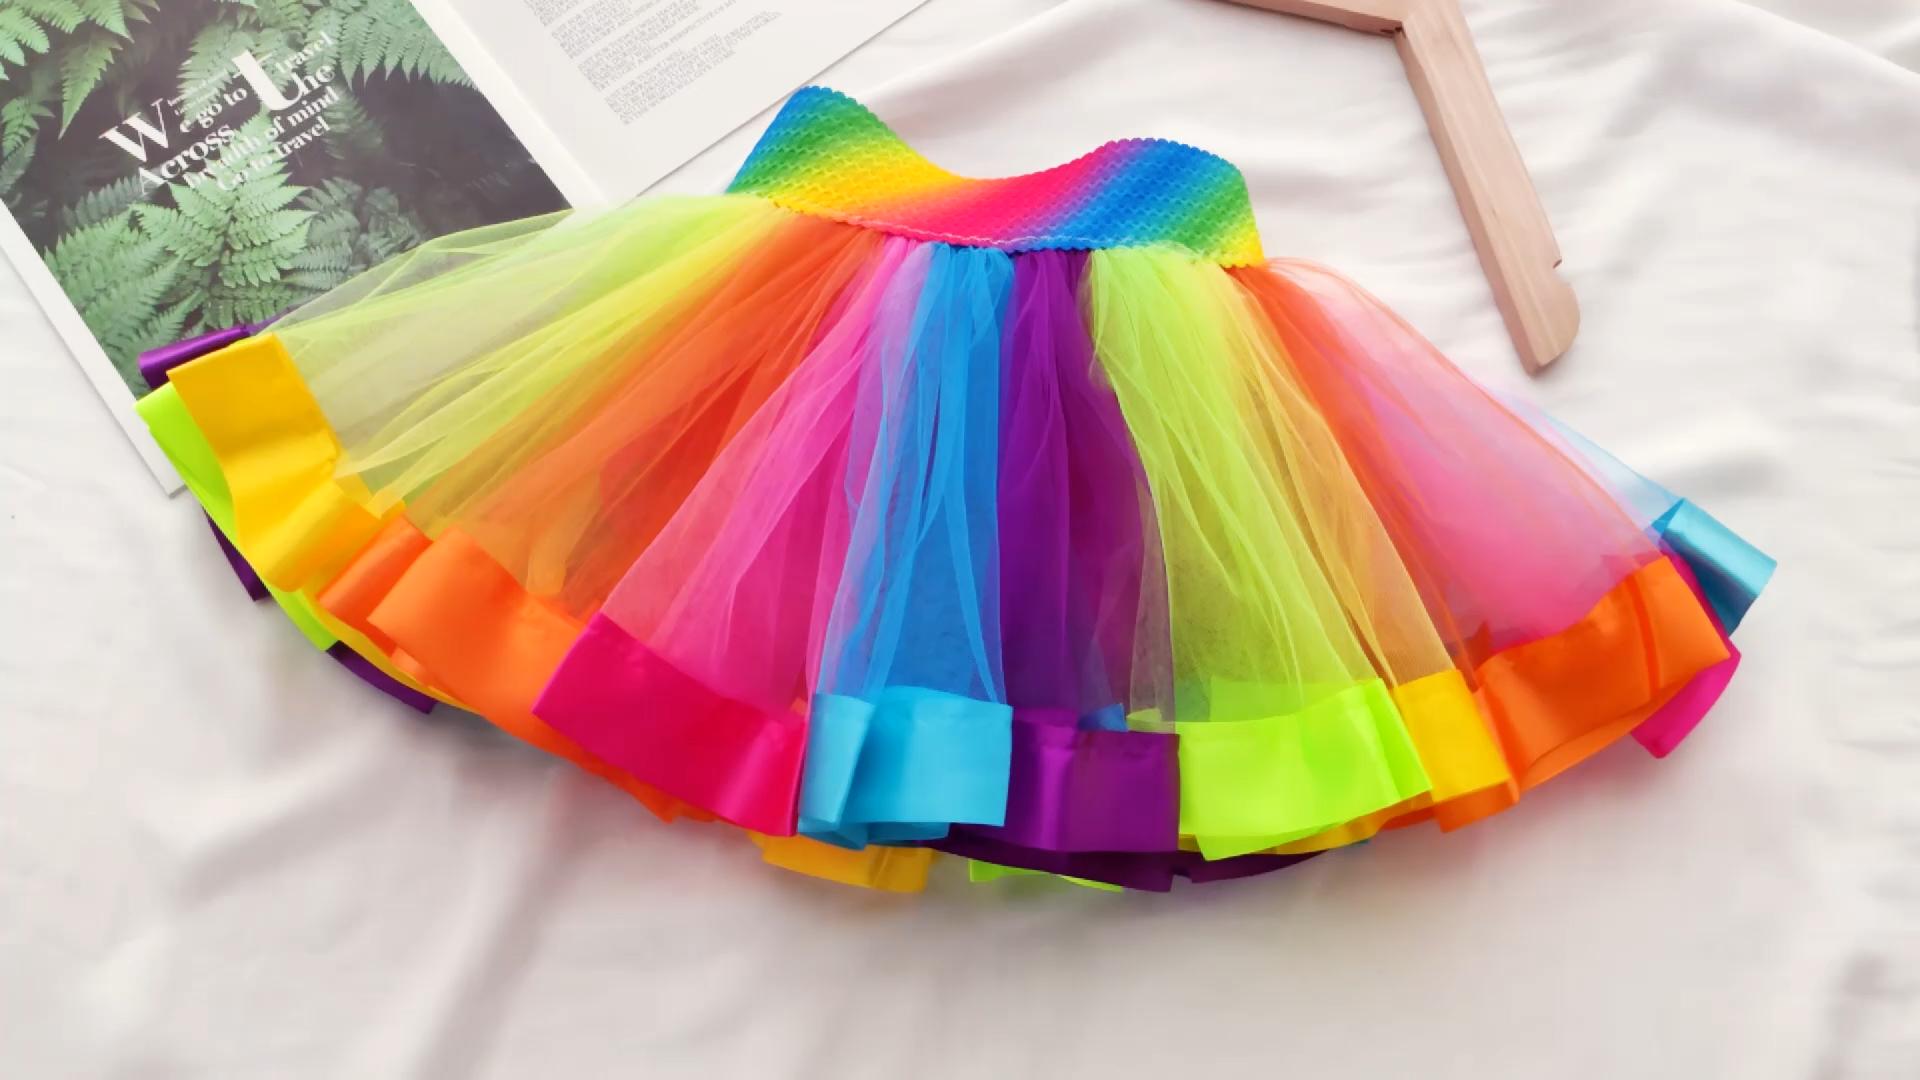 China Wholesale Hot Selling Kids Tutu Frock Children Rainbow Colorful Satin Tutu Skirt For Girls